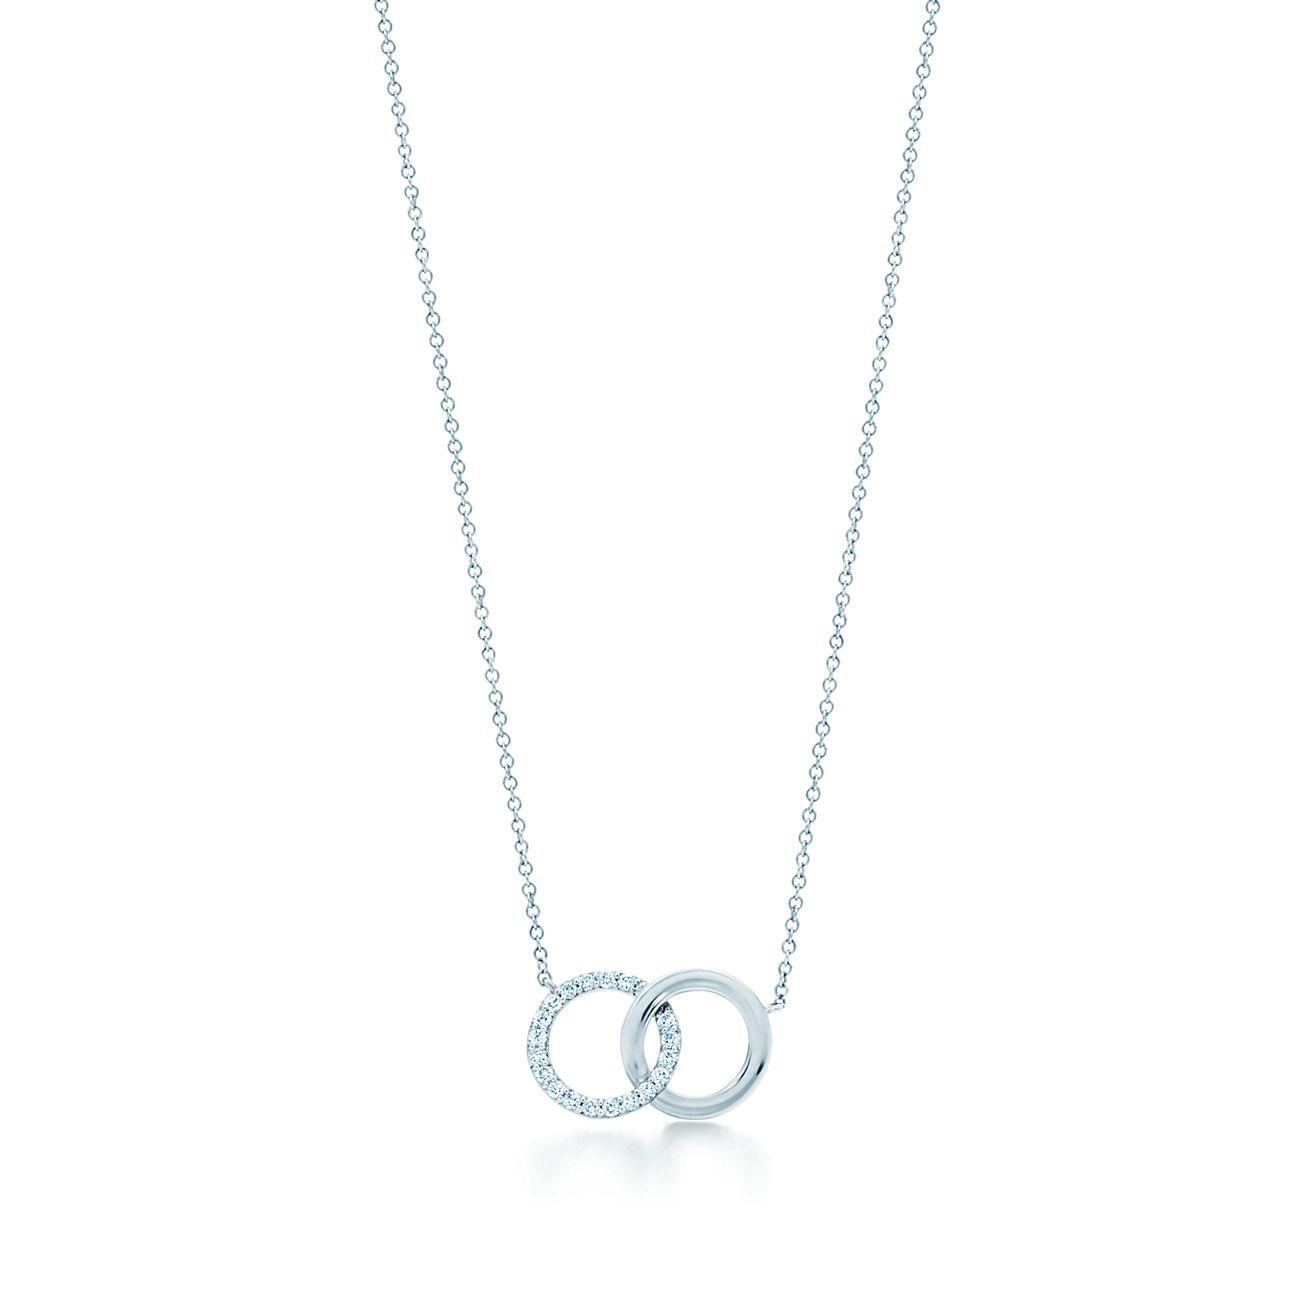 Tiffany 1837 circle pendant in 18k gold with diamonds Tiffany & Co.